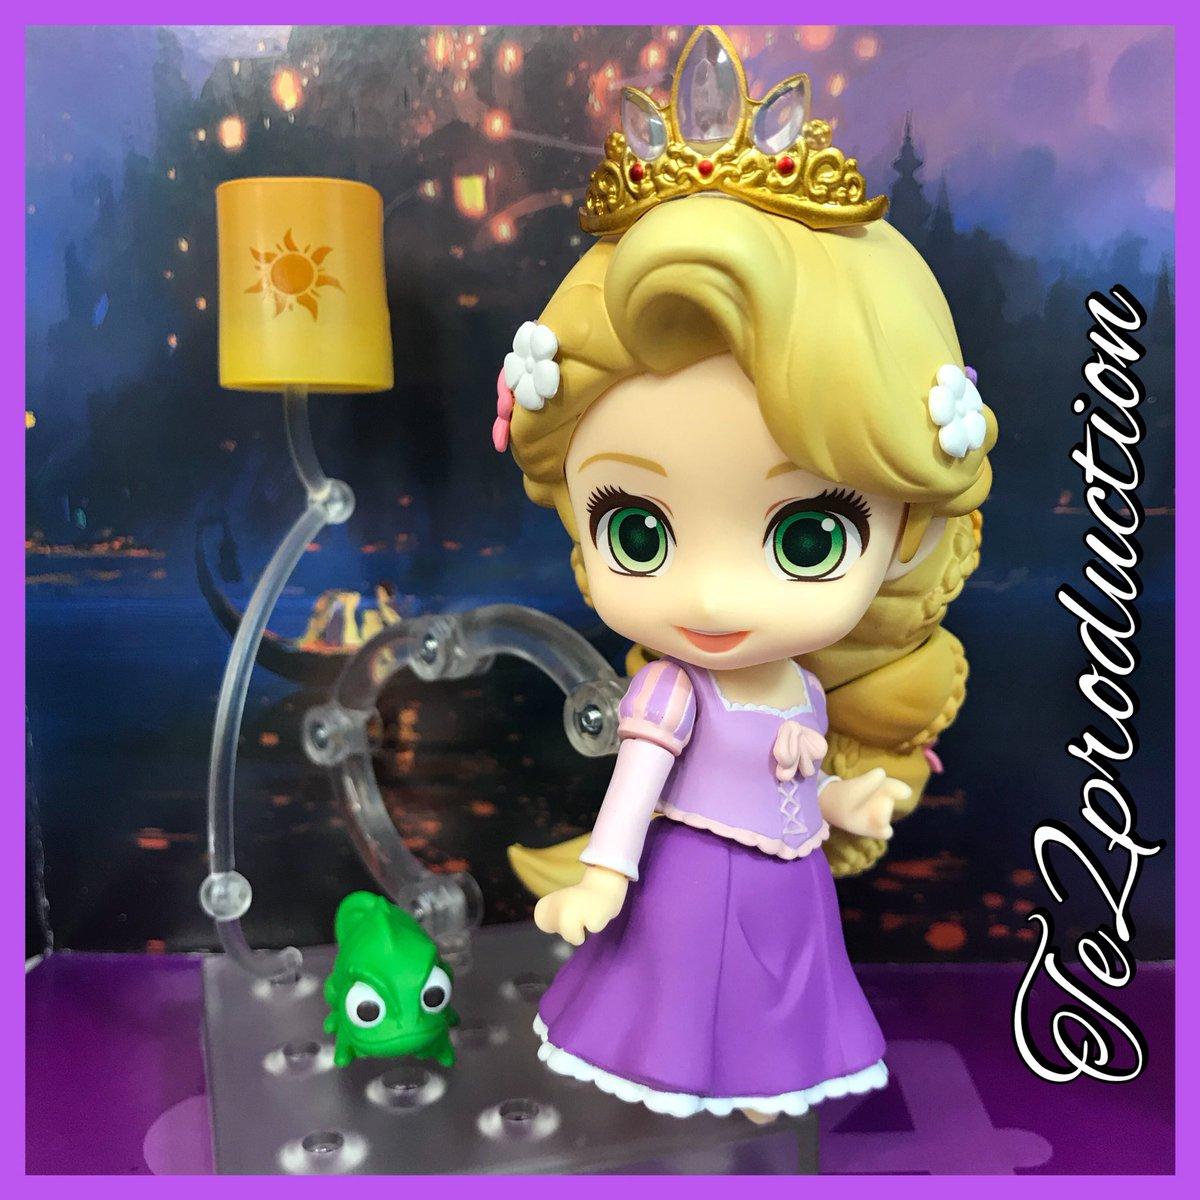 Erikku On Twitter Https Tco B229qwcnd2 Disney Tangled Figure Rapunzel Raiponce Nendoroid Goodsmilecompany Pascal Collection Review